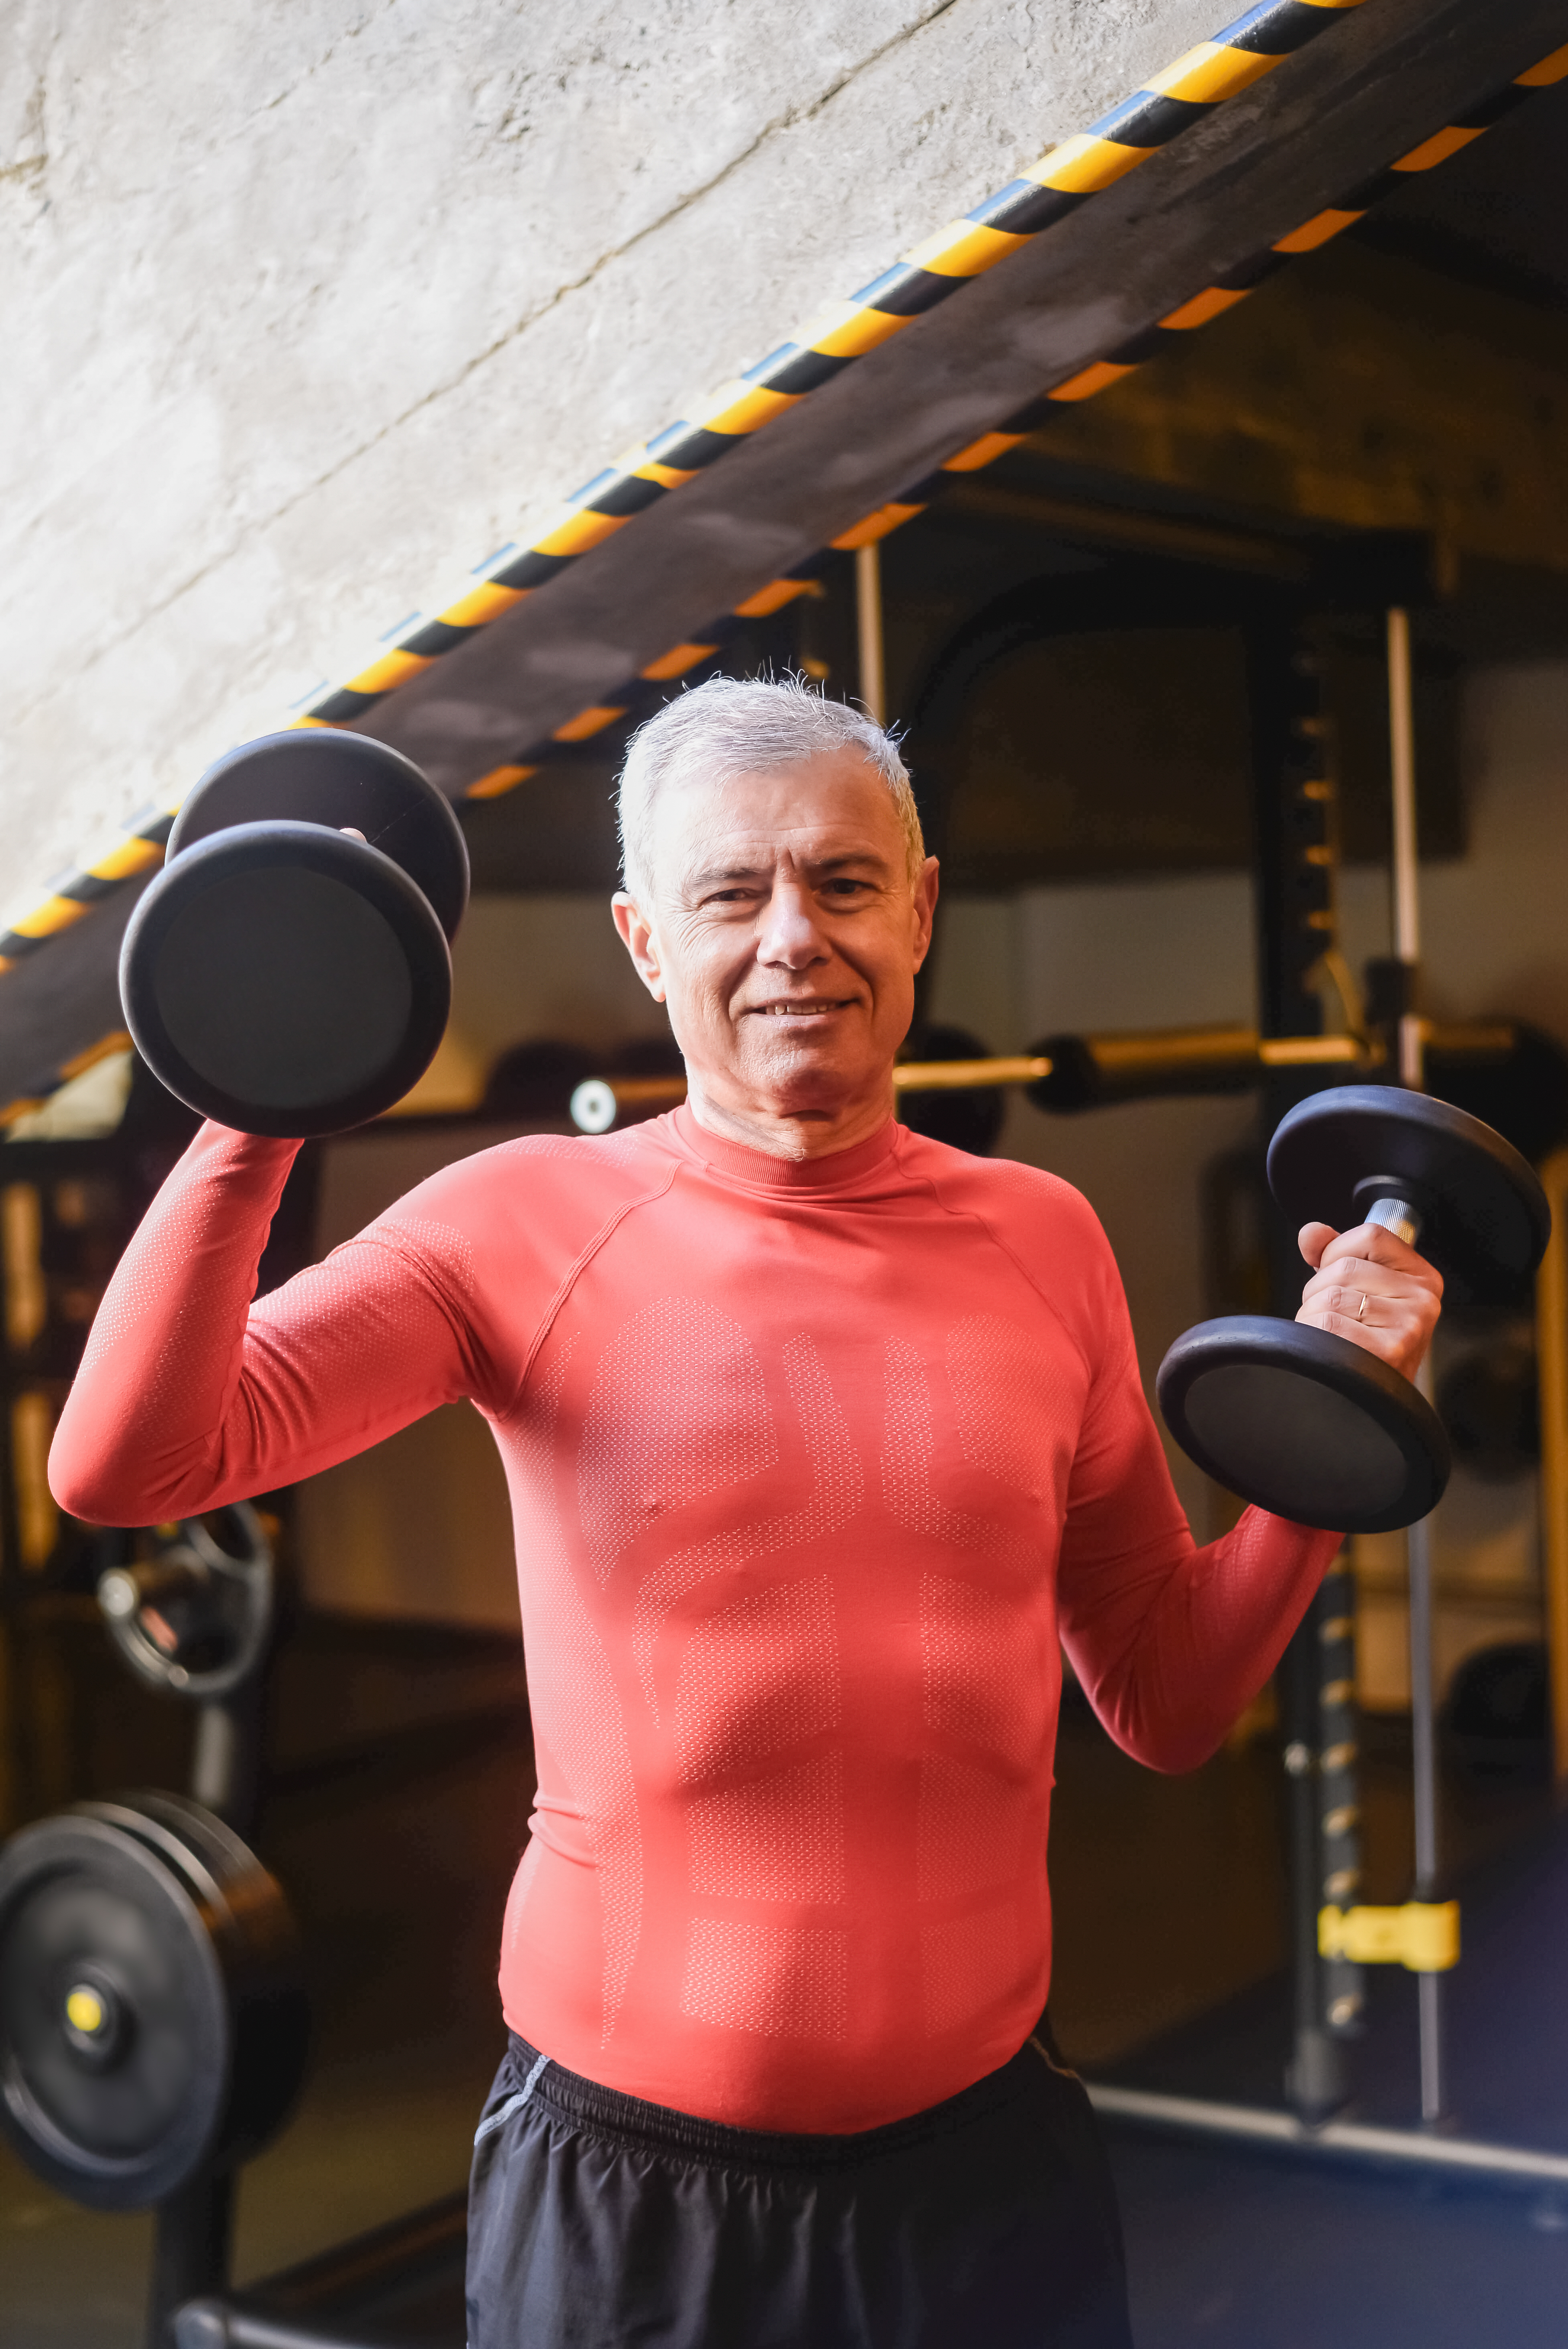 man sport club strength